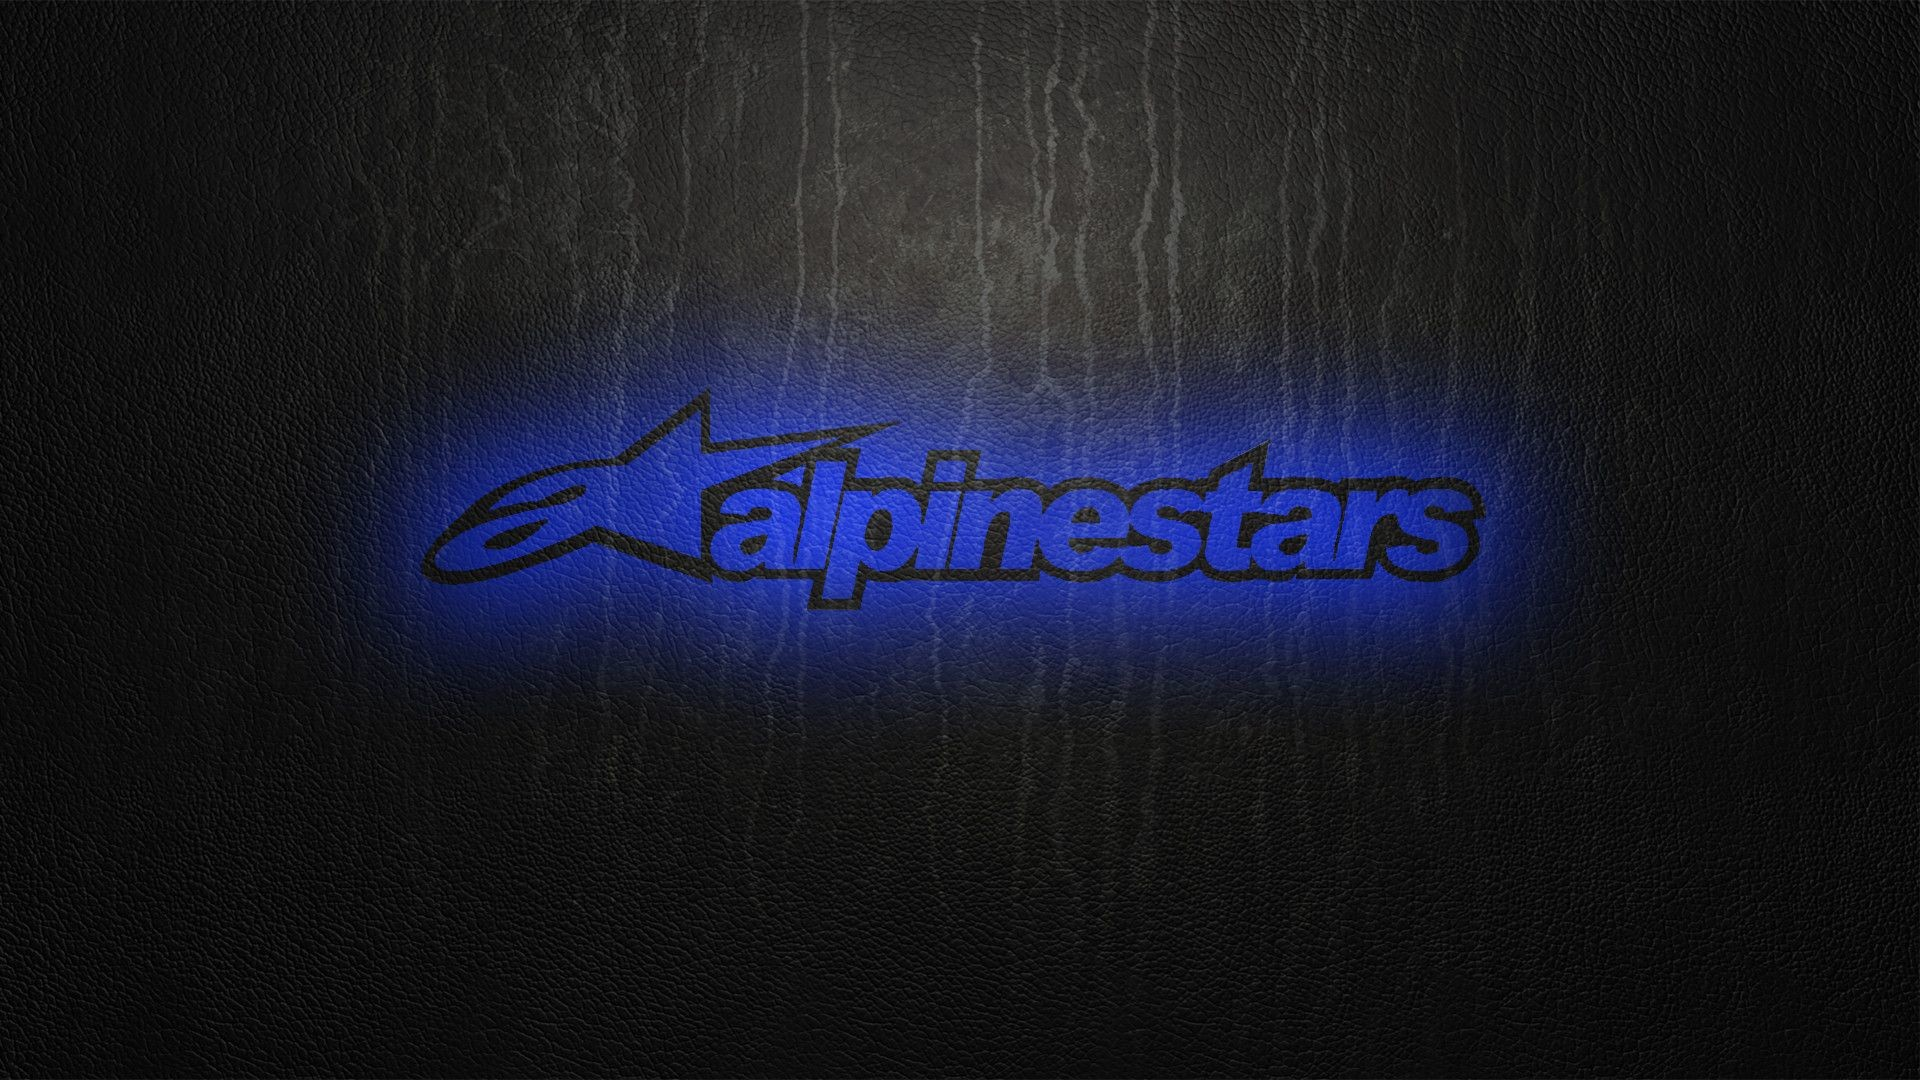 Alpinestars Wallpaper 76 Pictures